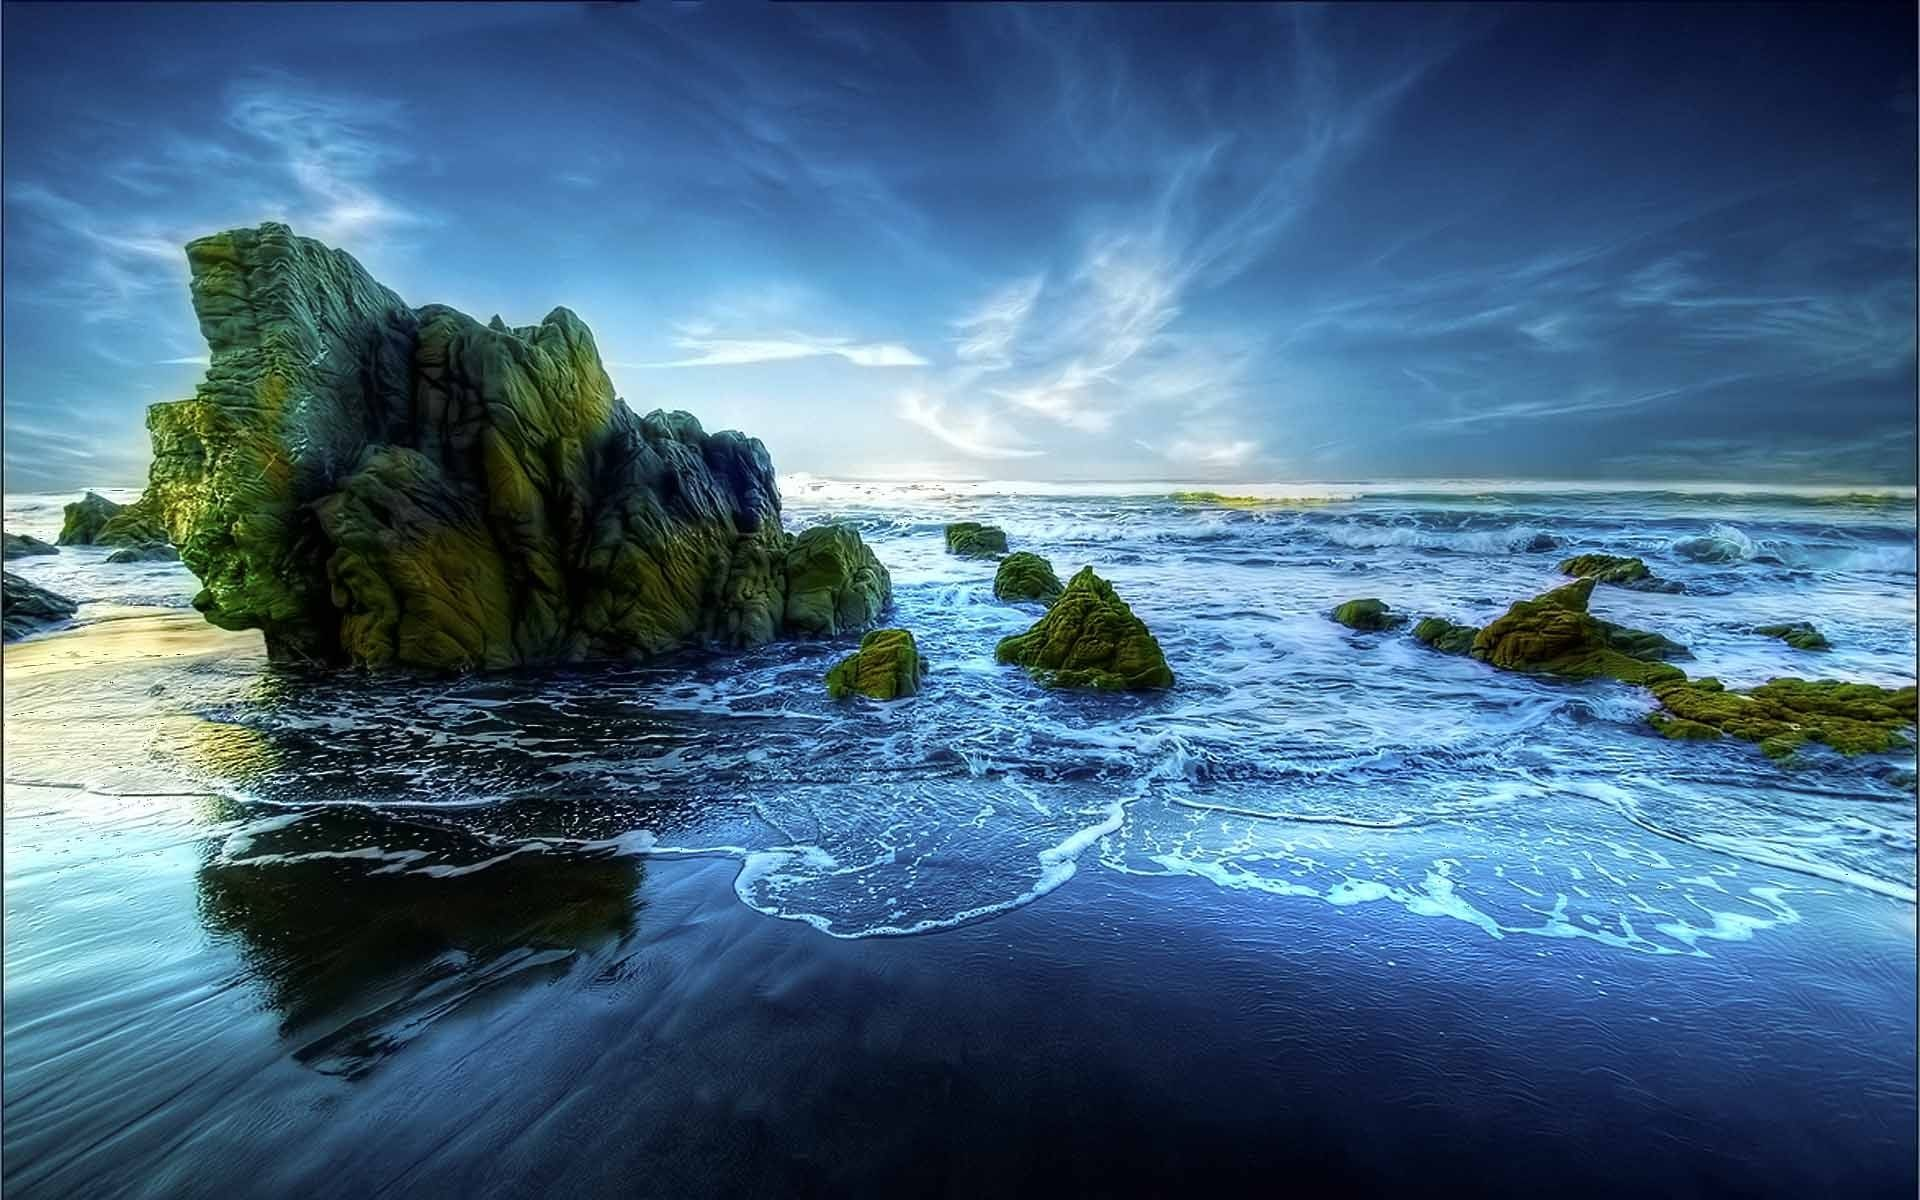 Peaceful Image For Desktop Wallpaper 1920 x 1200 px 692.31 KB beach garden  zen mind relaxing